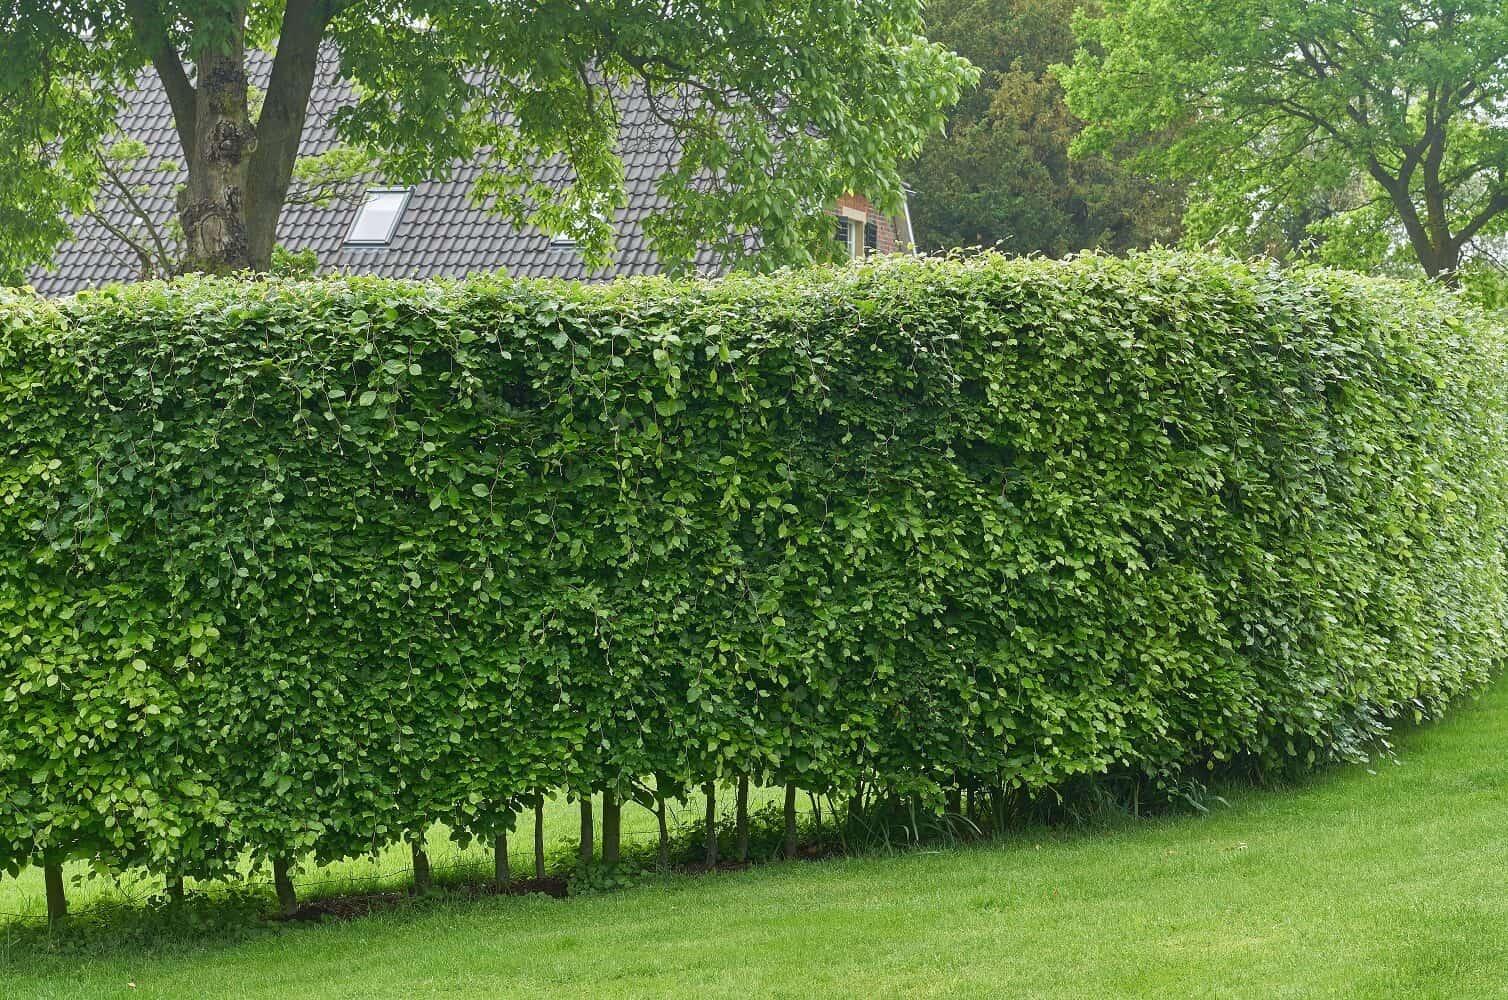 Fast Growing Hedges - European Hornbeam Hedge - Carpinus betulus Featured